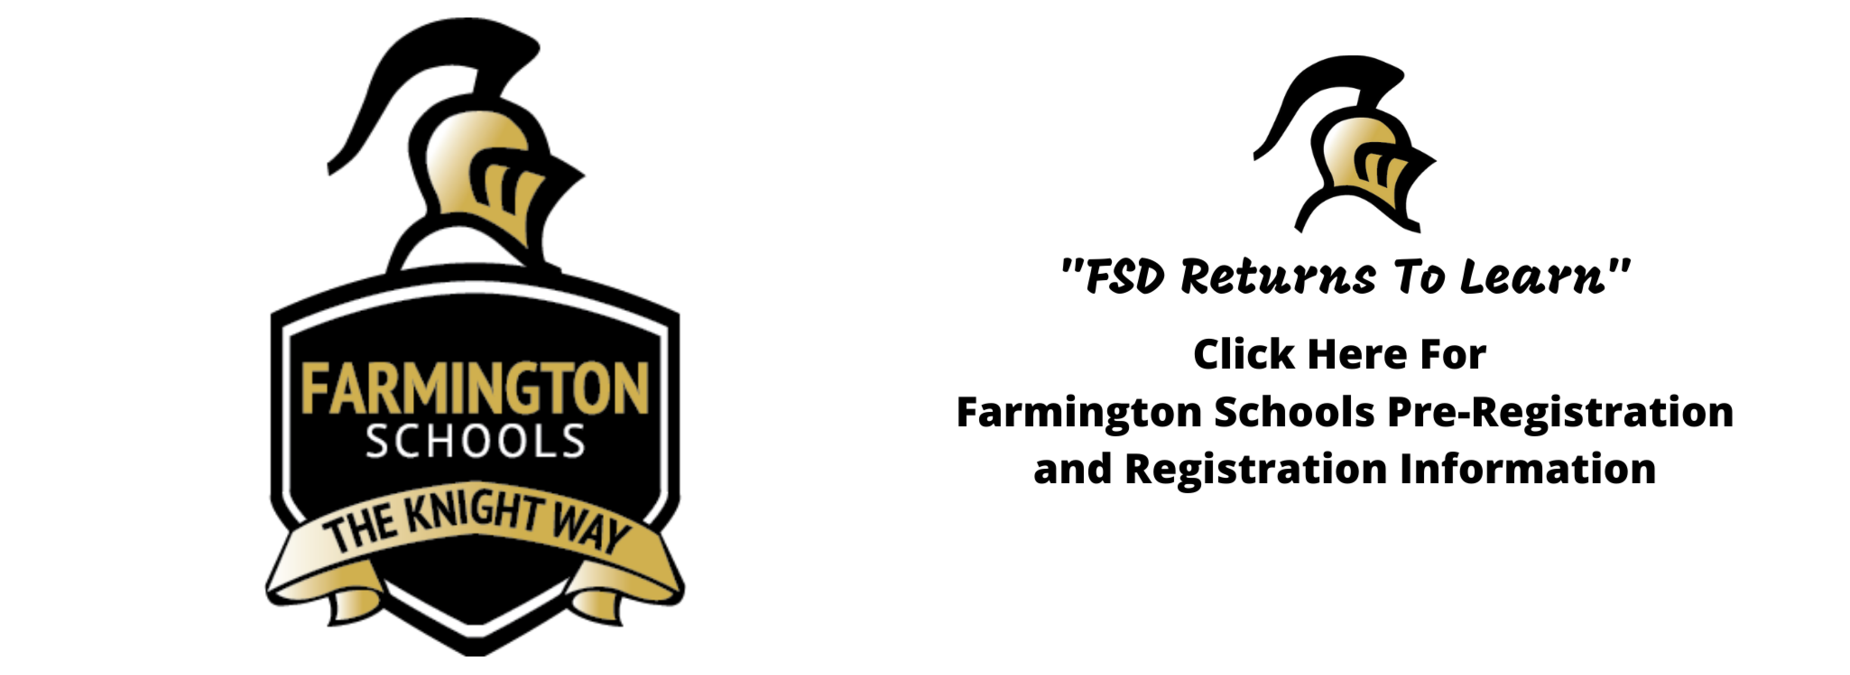 Click Here For Farmington Registration Information